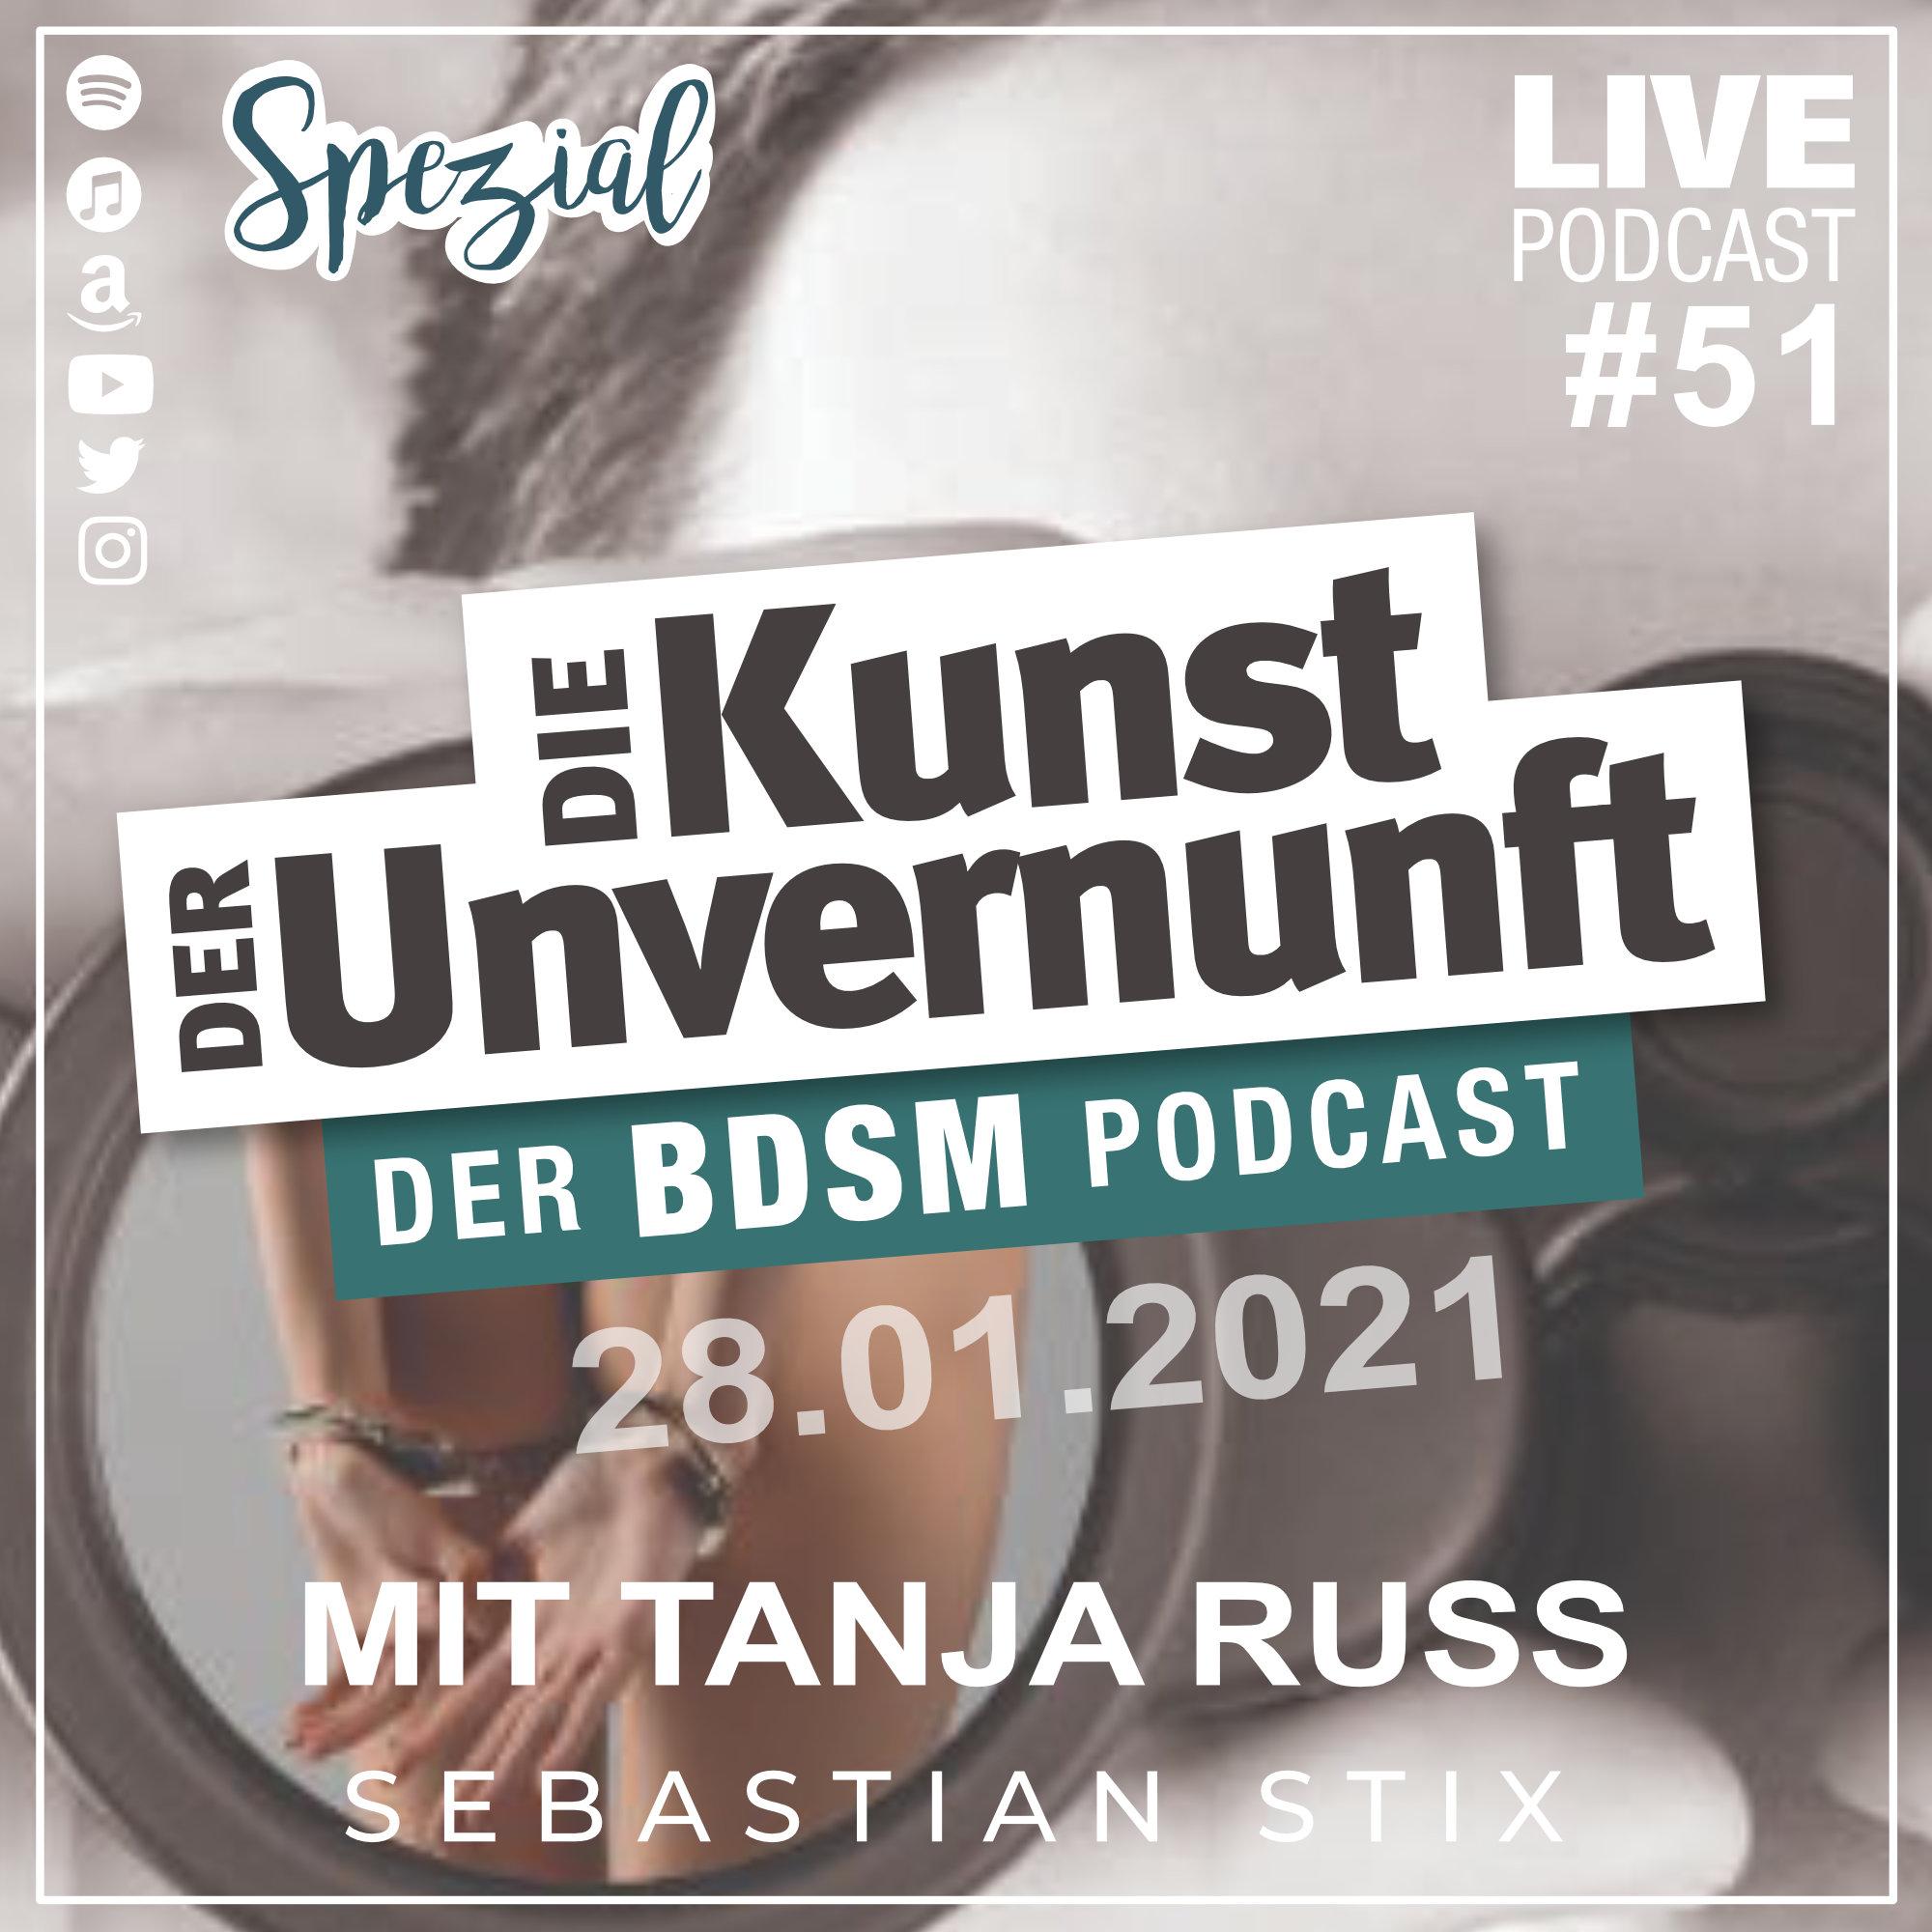 Unvernunft Live Spezial 28.01.2021 - Leseabend mit Tanja Russ